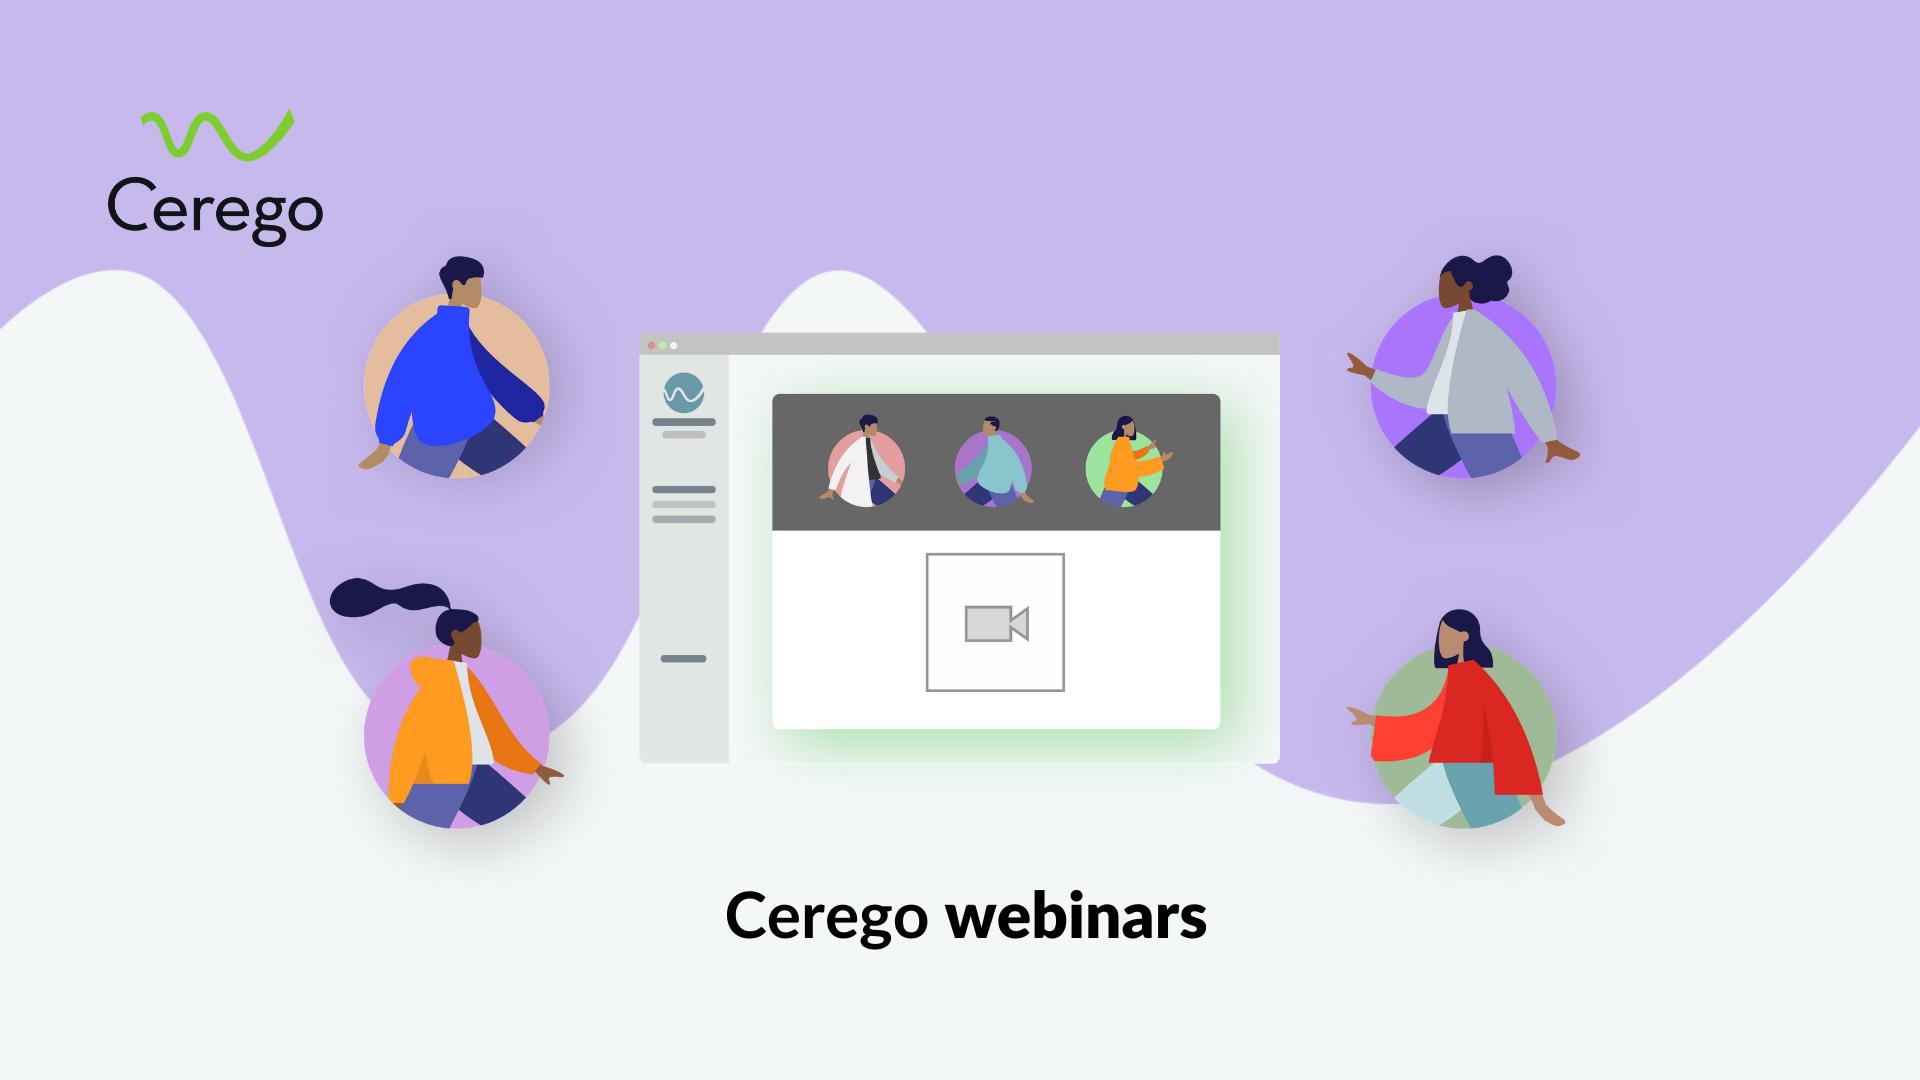 Cerego webinars